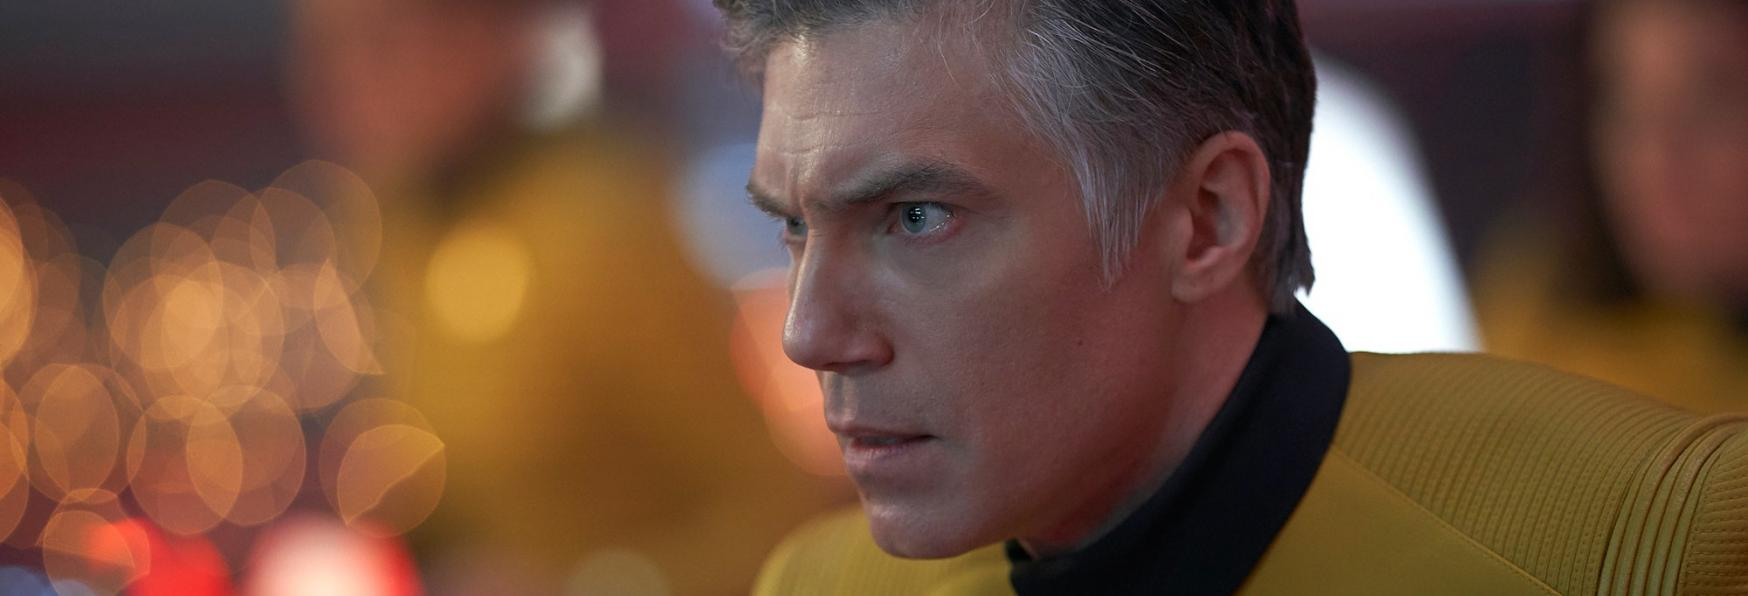 Star Trek: Strange New Worlds - Anson Mount parla delle Riprese della nuova Serie TV